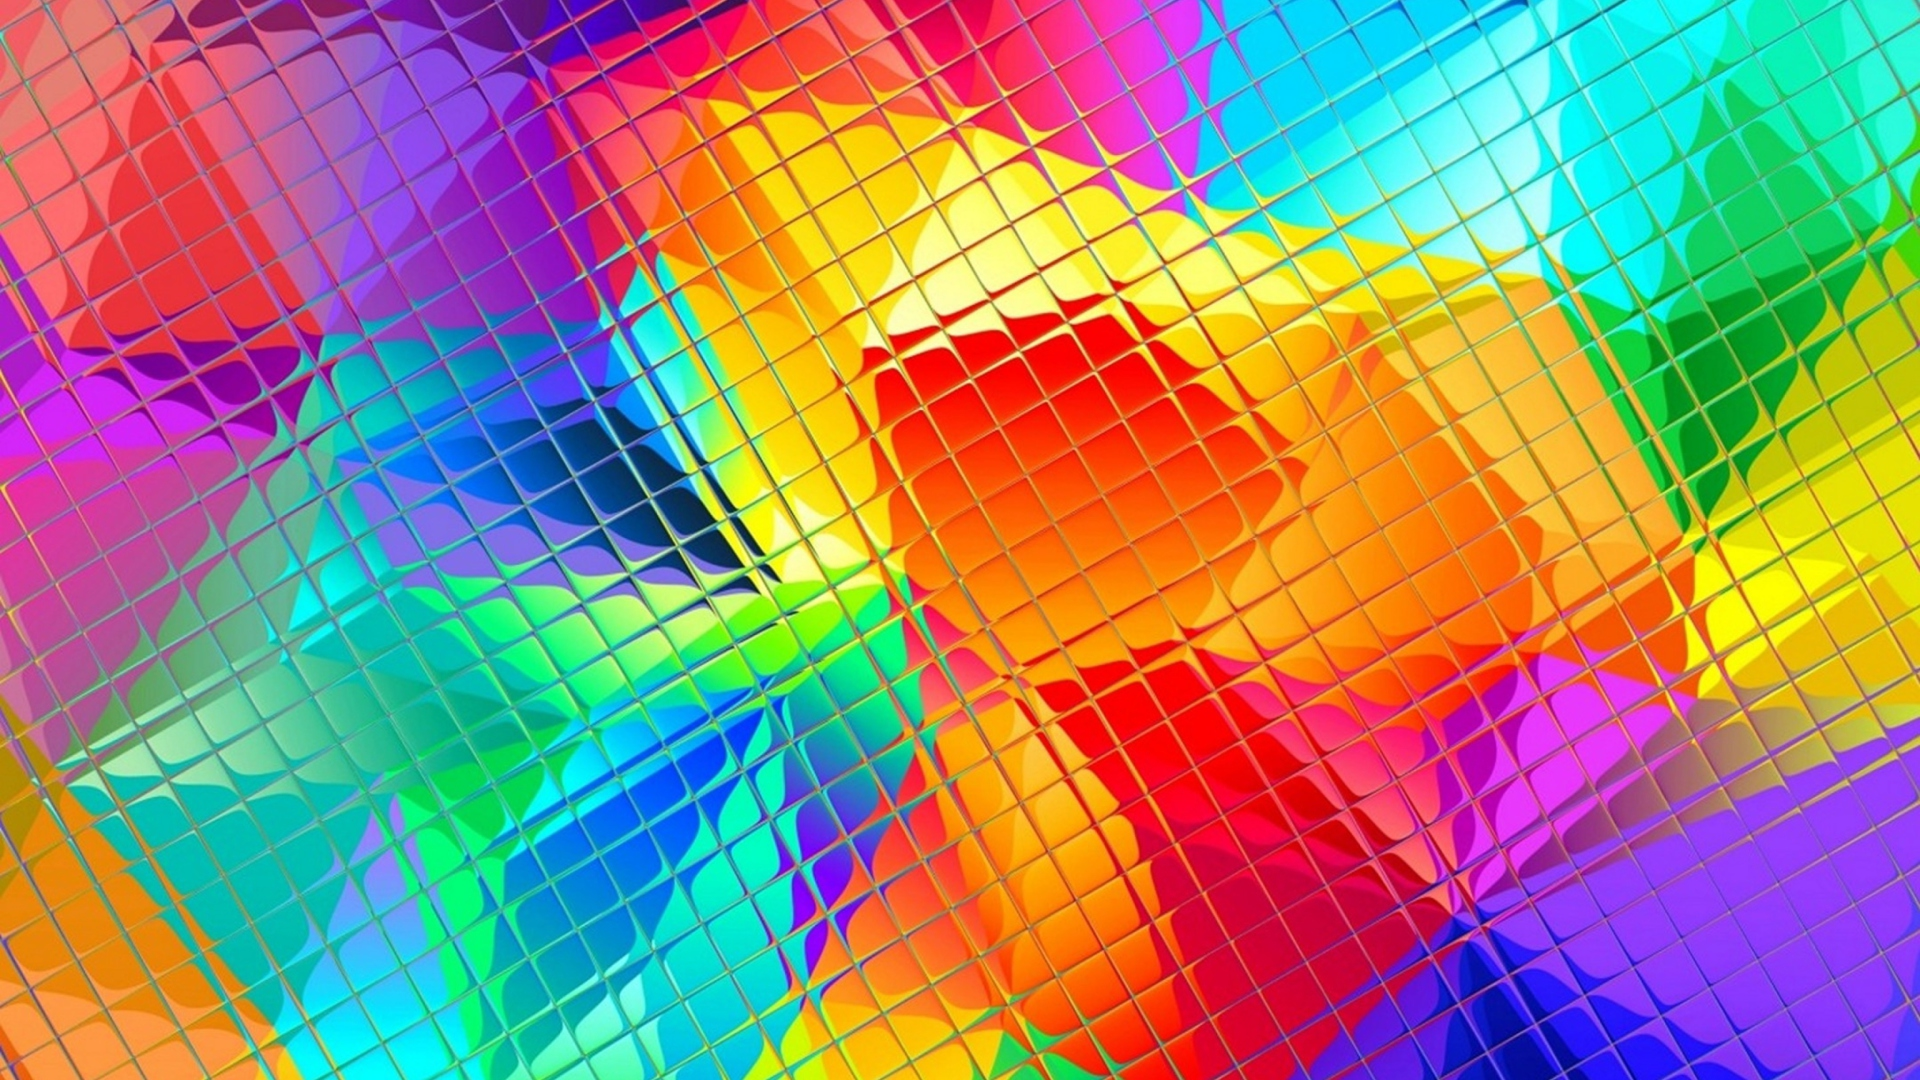 Galaxy S5 Crystal Wallpaper For Desktop 1920x1080 Full HD